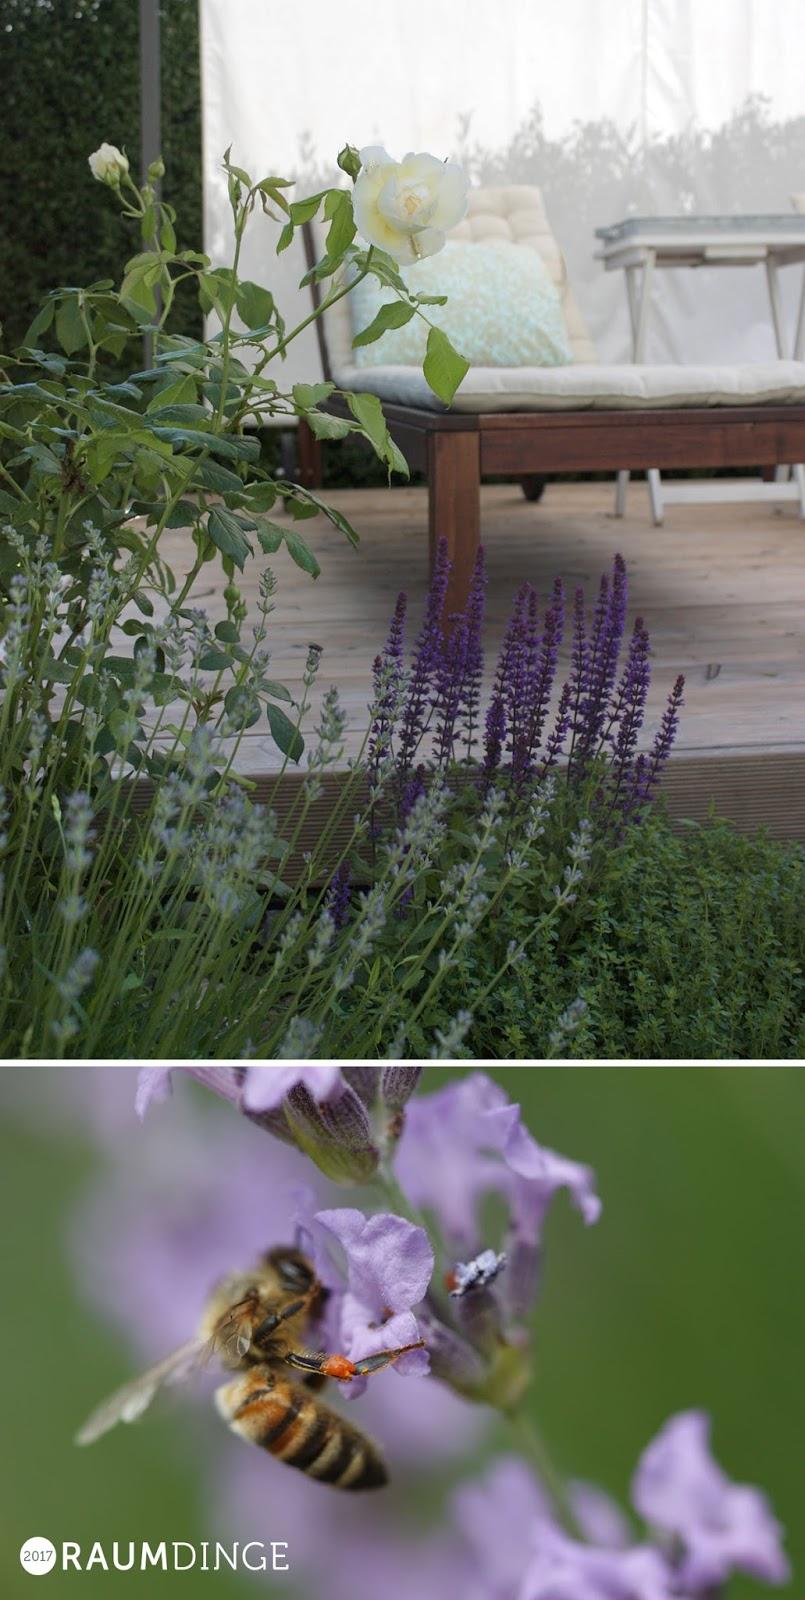 Biene mit Blütenpollen an Lavendelblüte